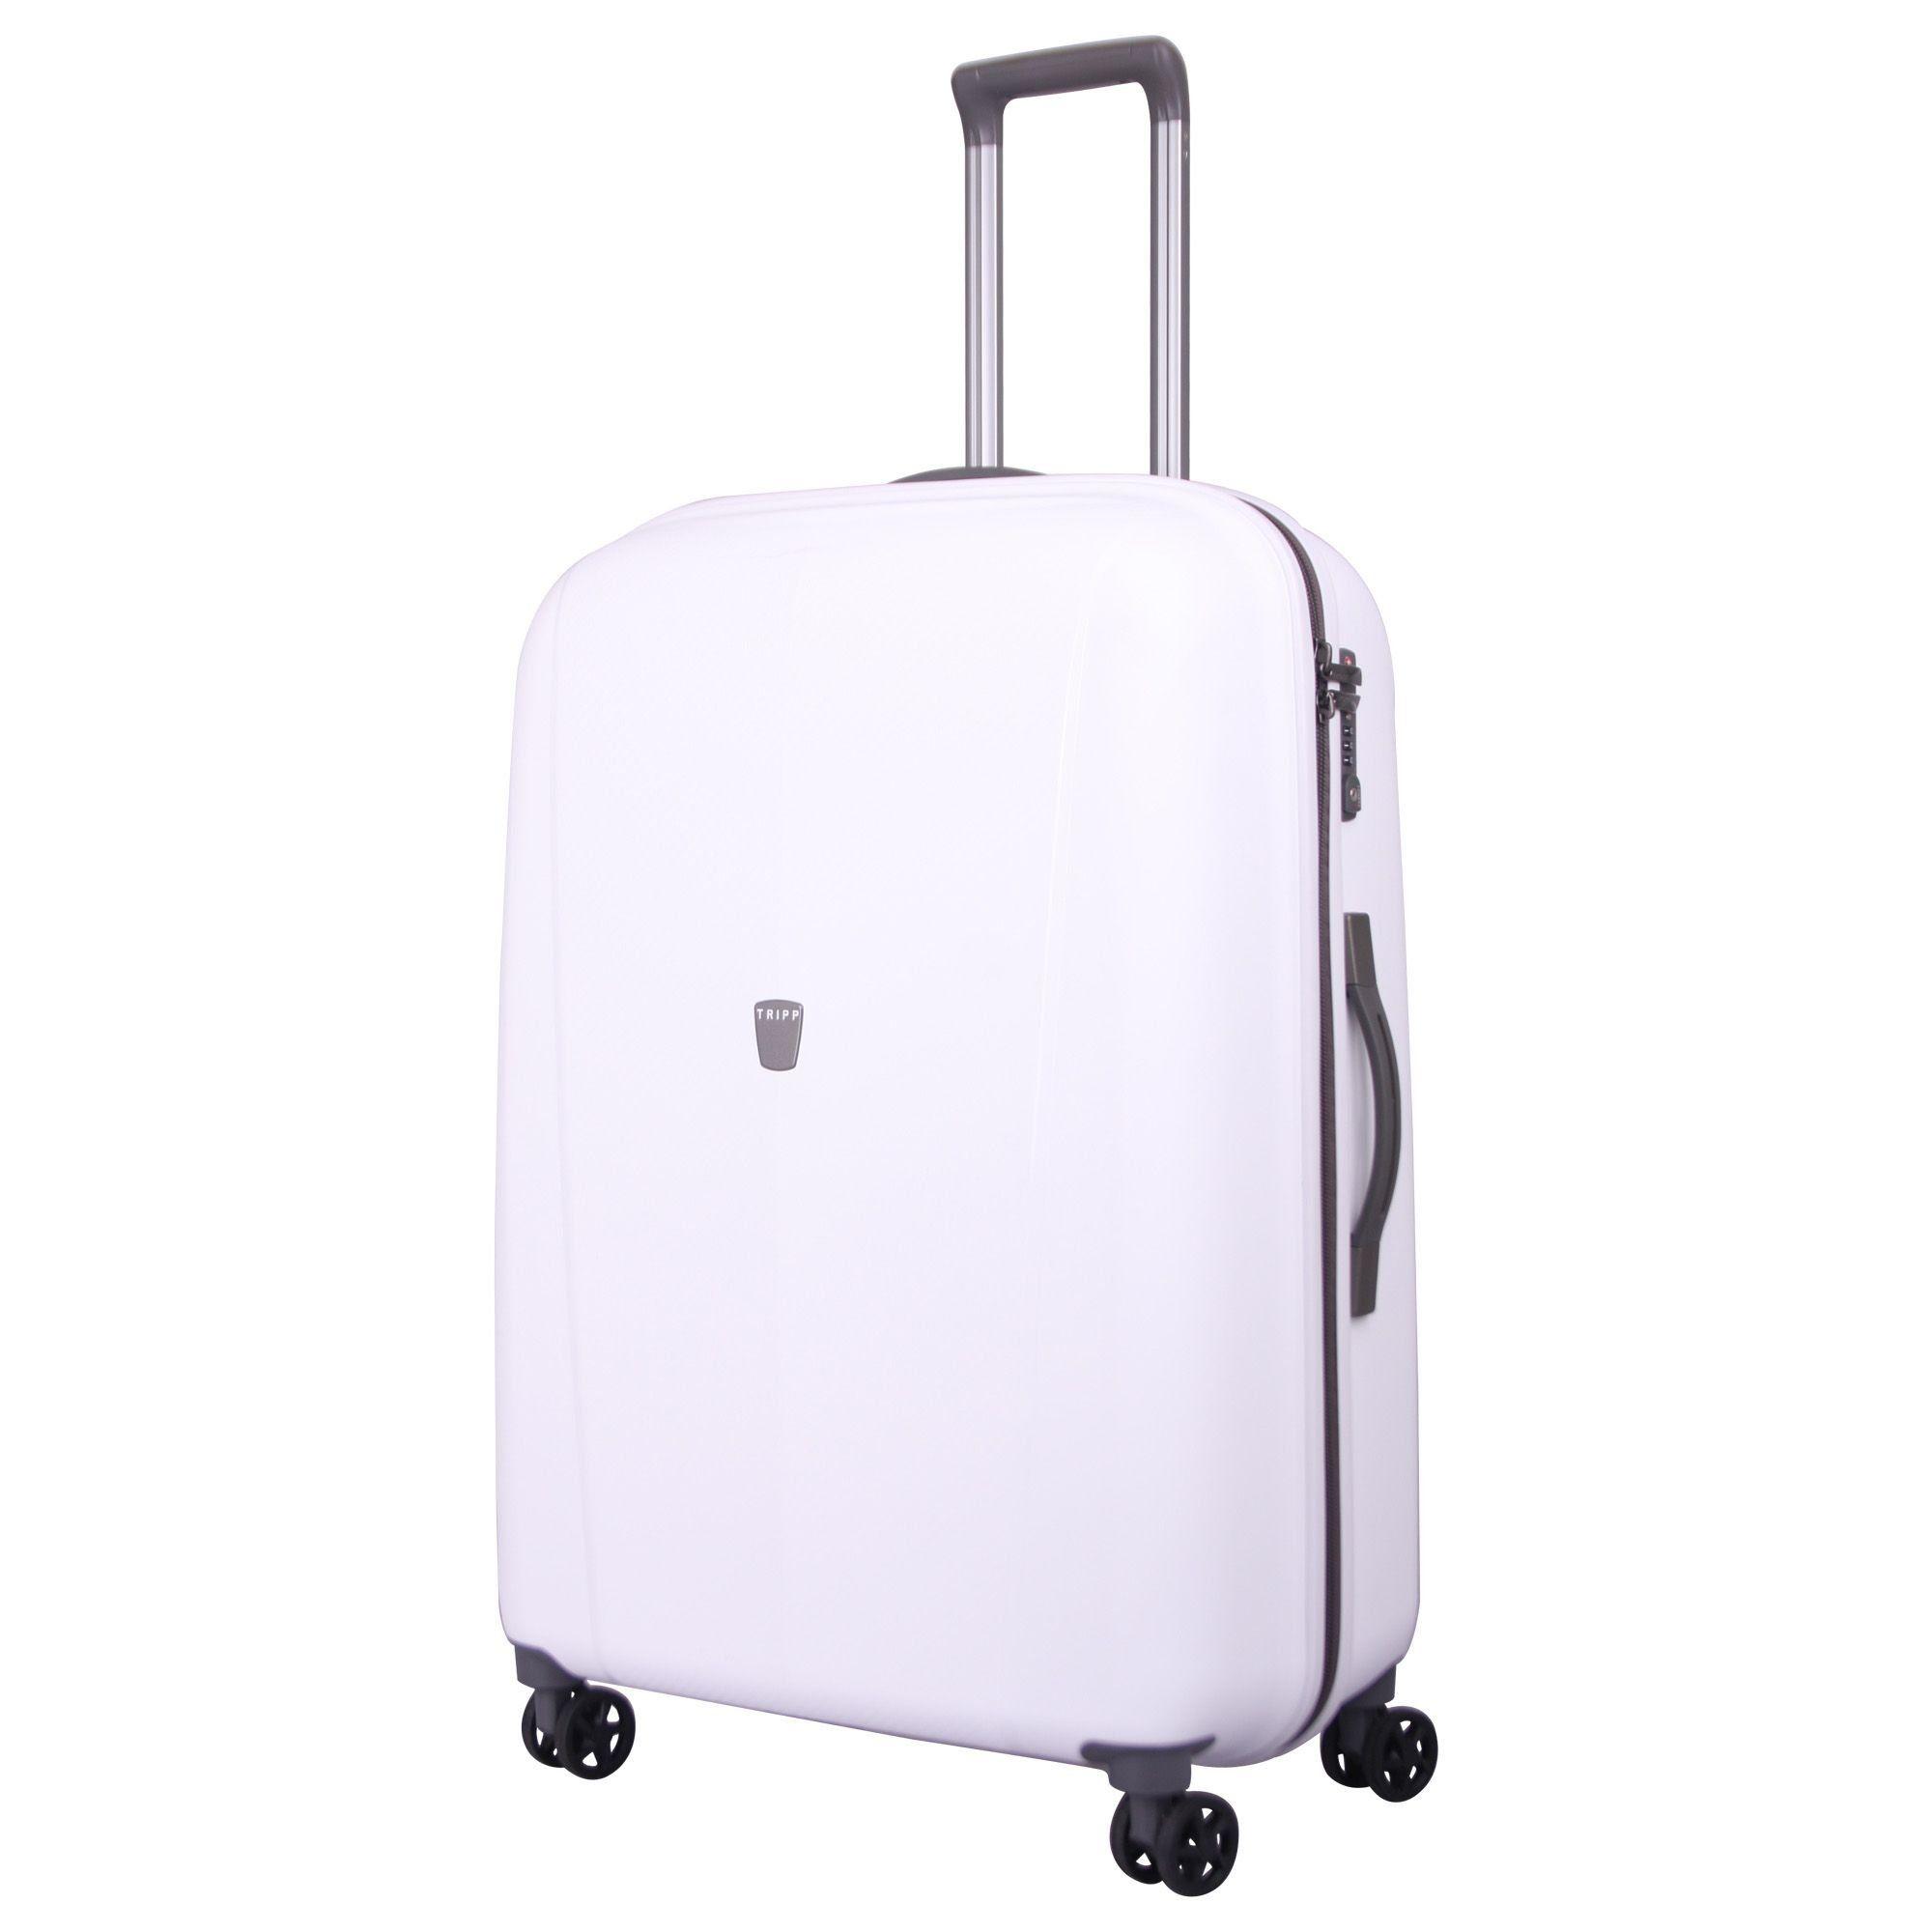 65efc6a4e Tripp White Ultimate Lite II Large 4 Wheel Suitcase Large Suitcase Colour:  WHITE 4 Wheels, Large, Tsa Lock The Ultimate Lite large 4 wheel travel  suitcase ...